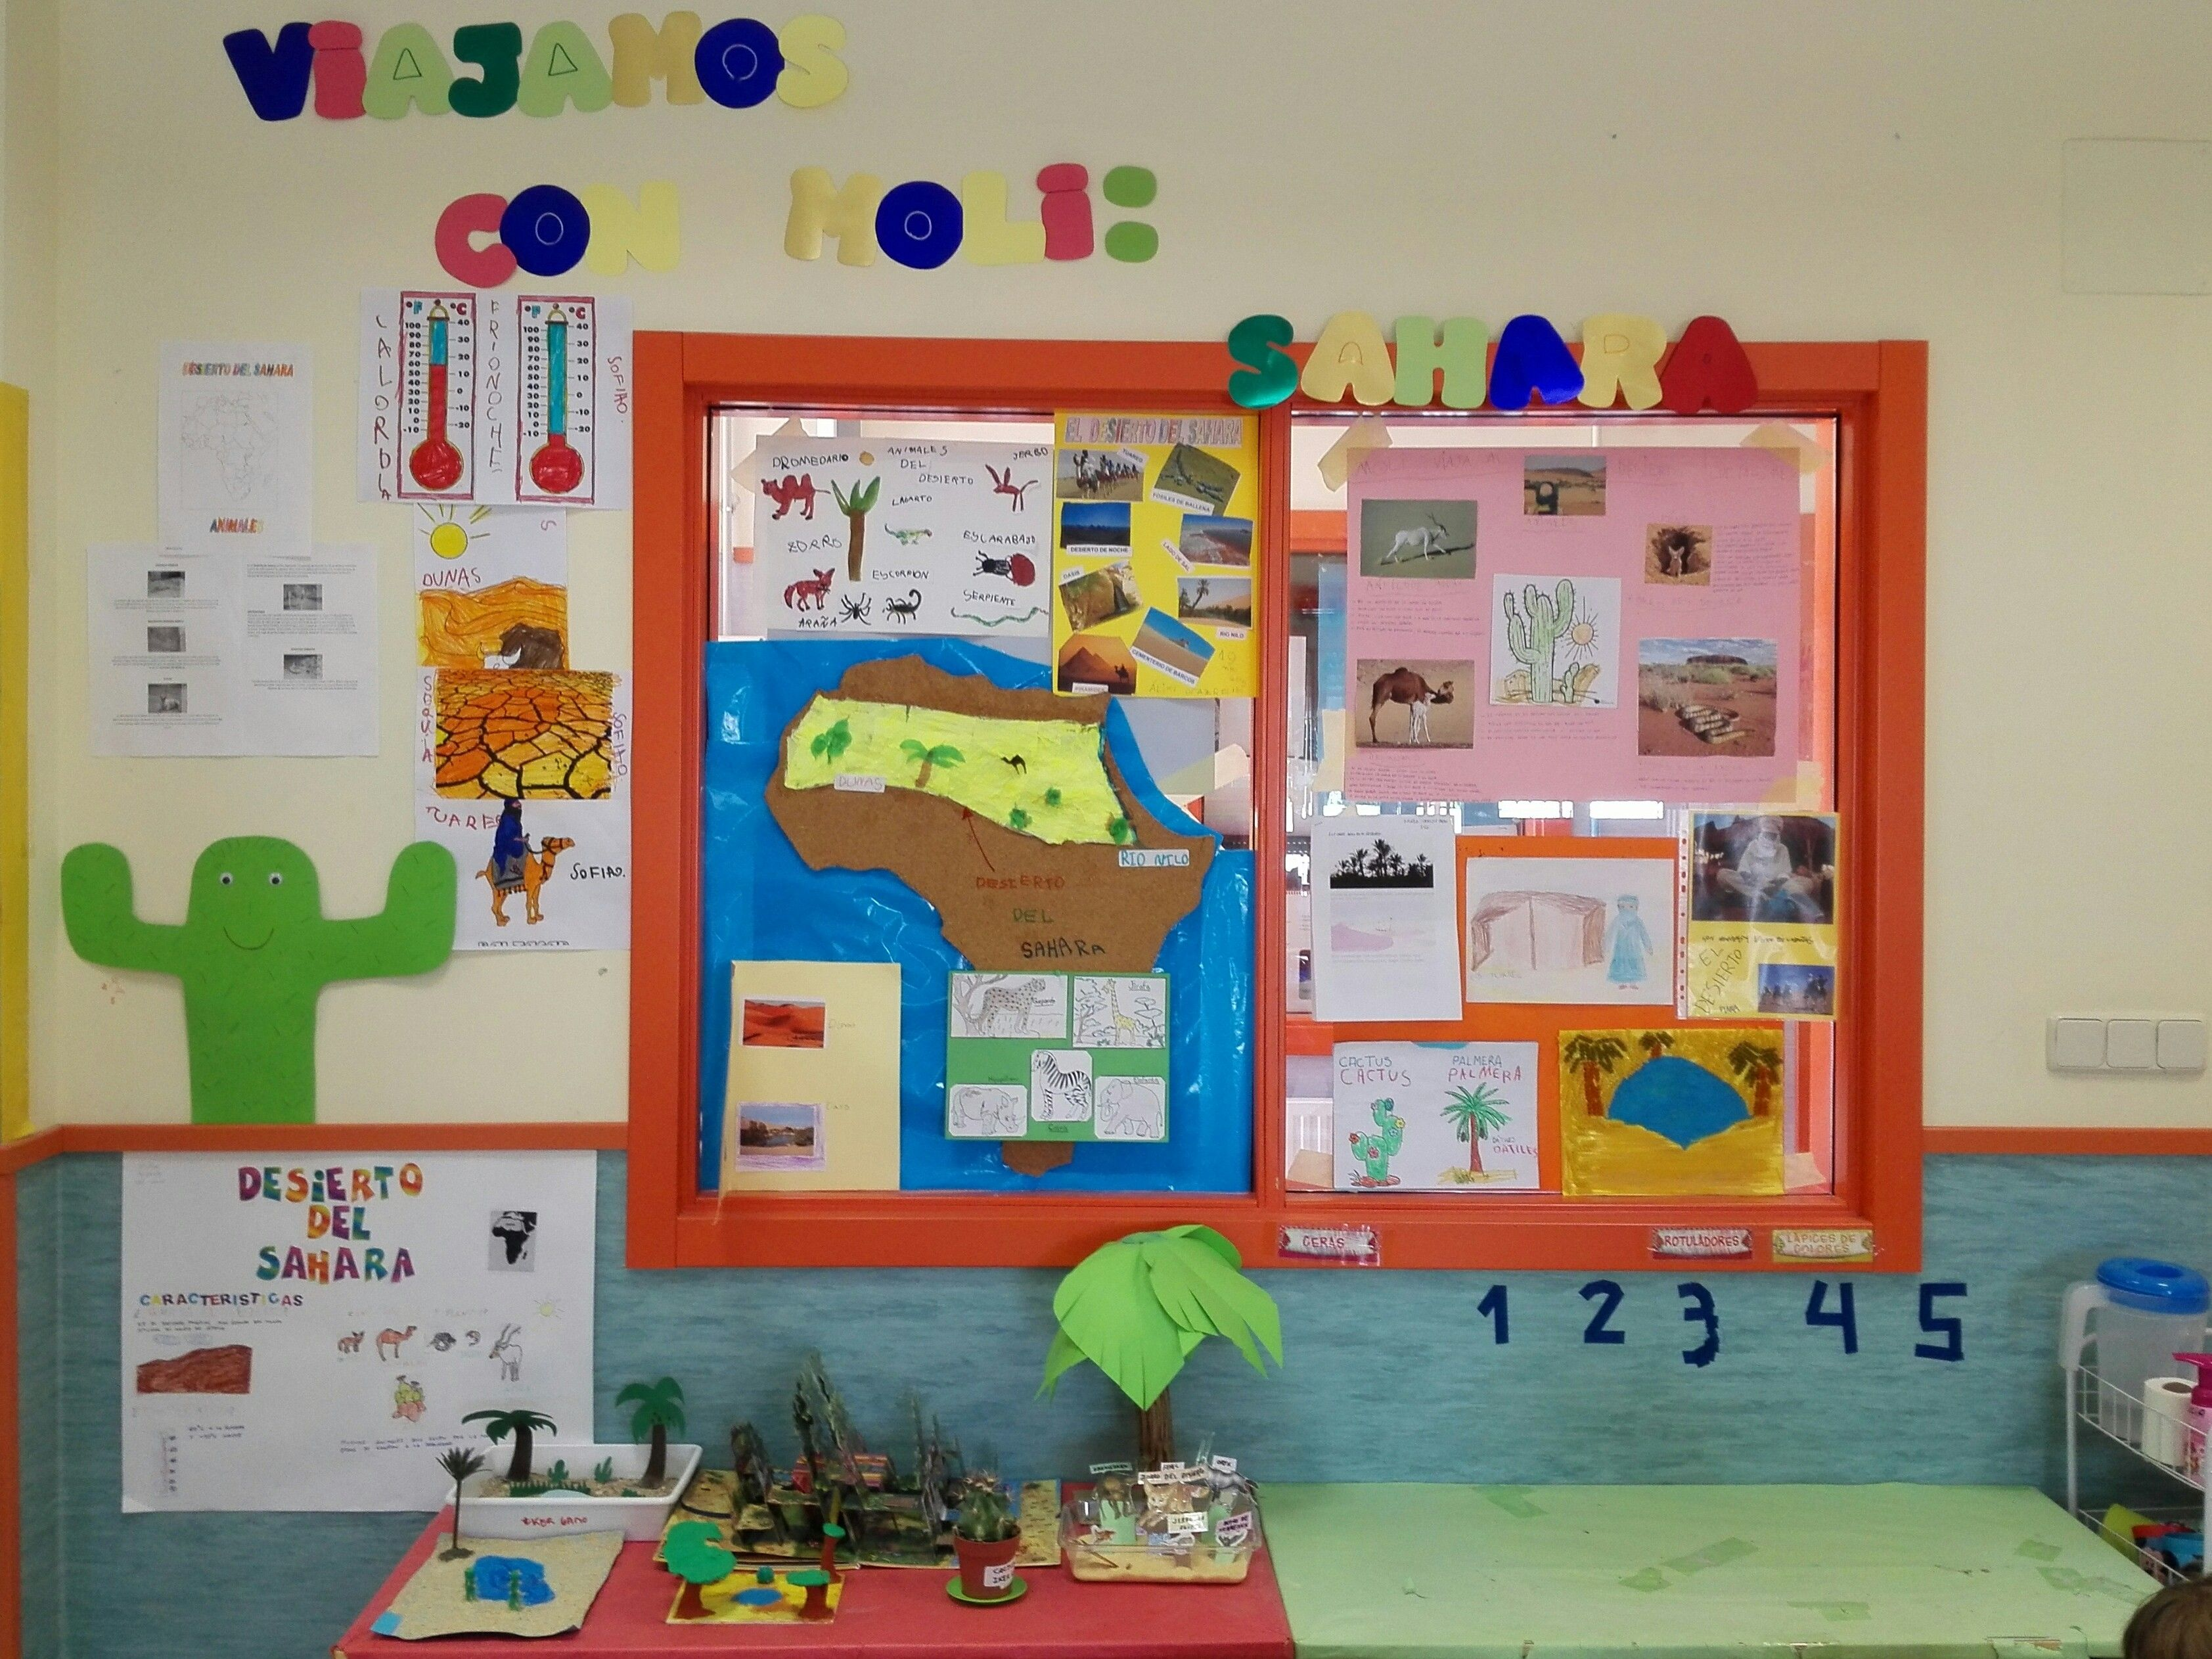 Proyecto Desierto Educacion Infantil